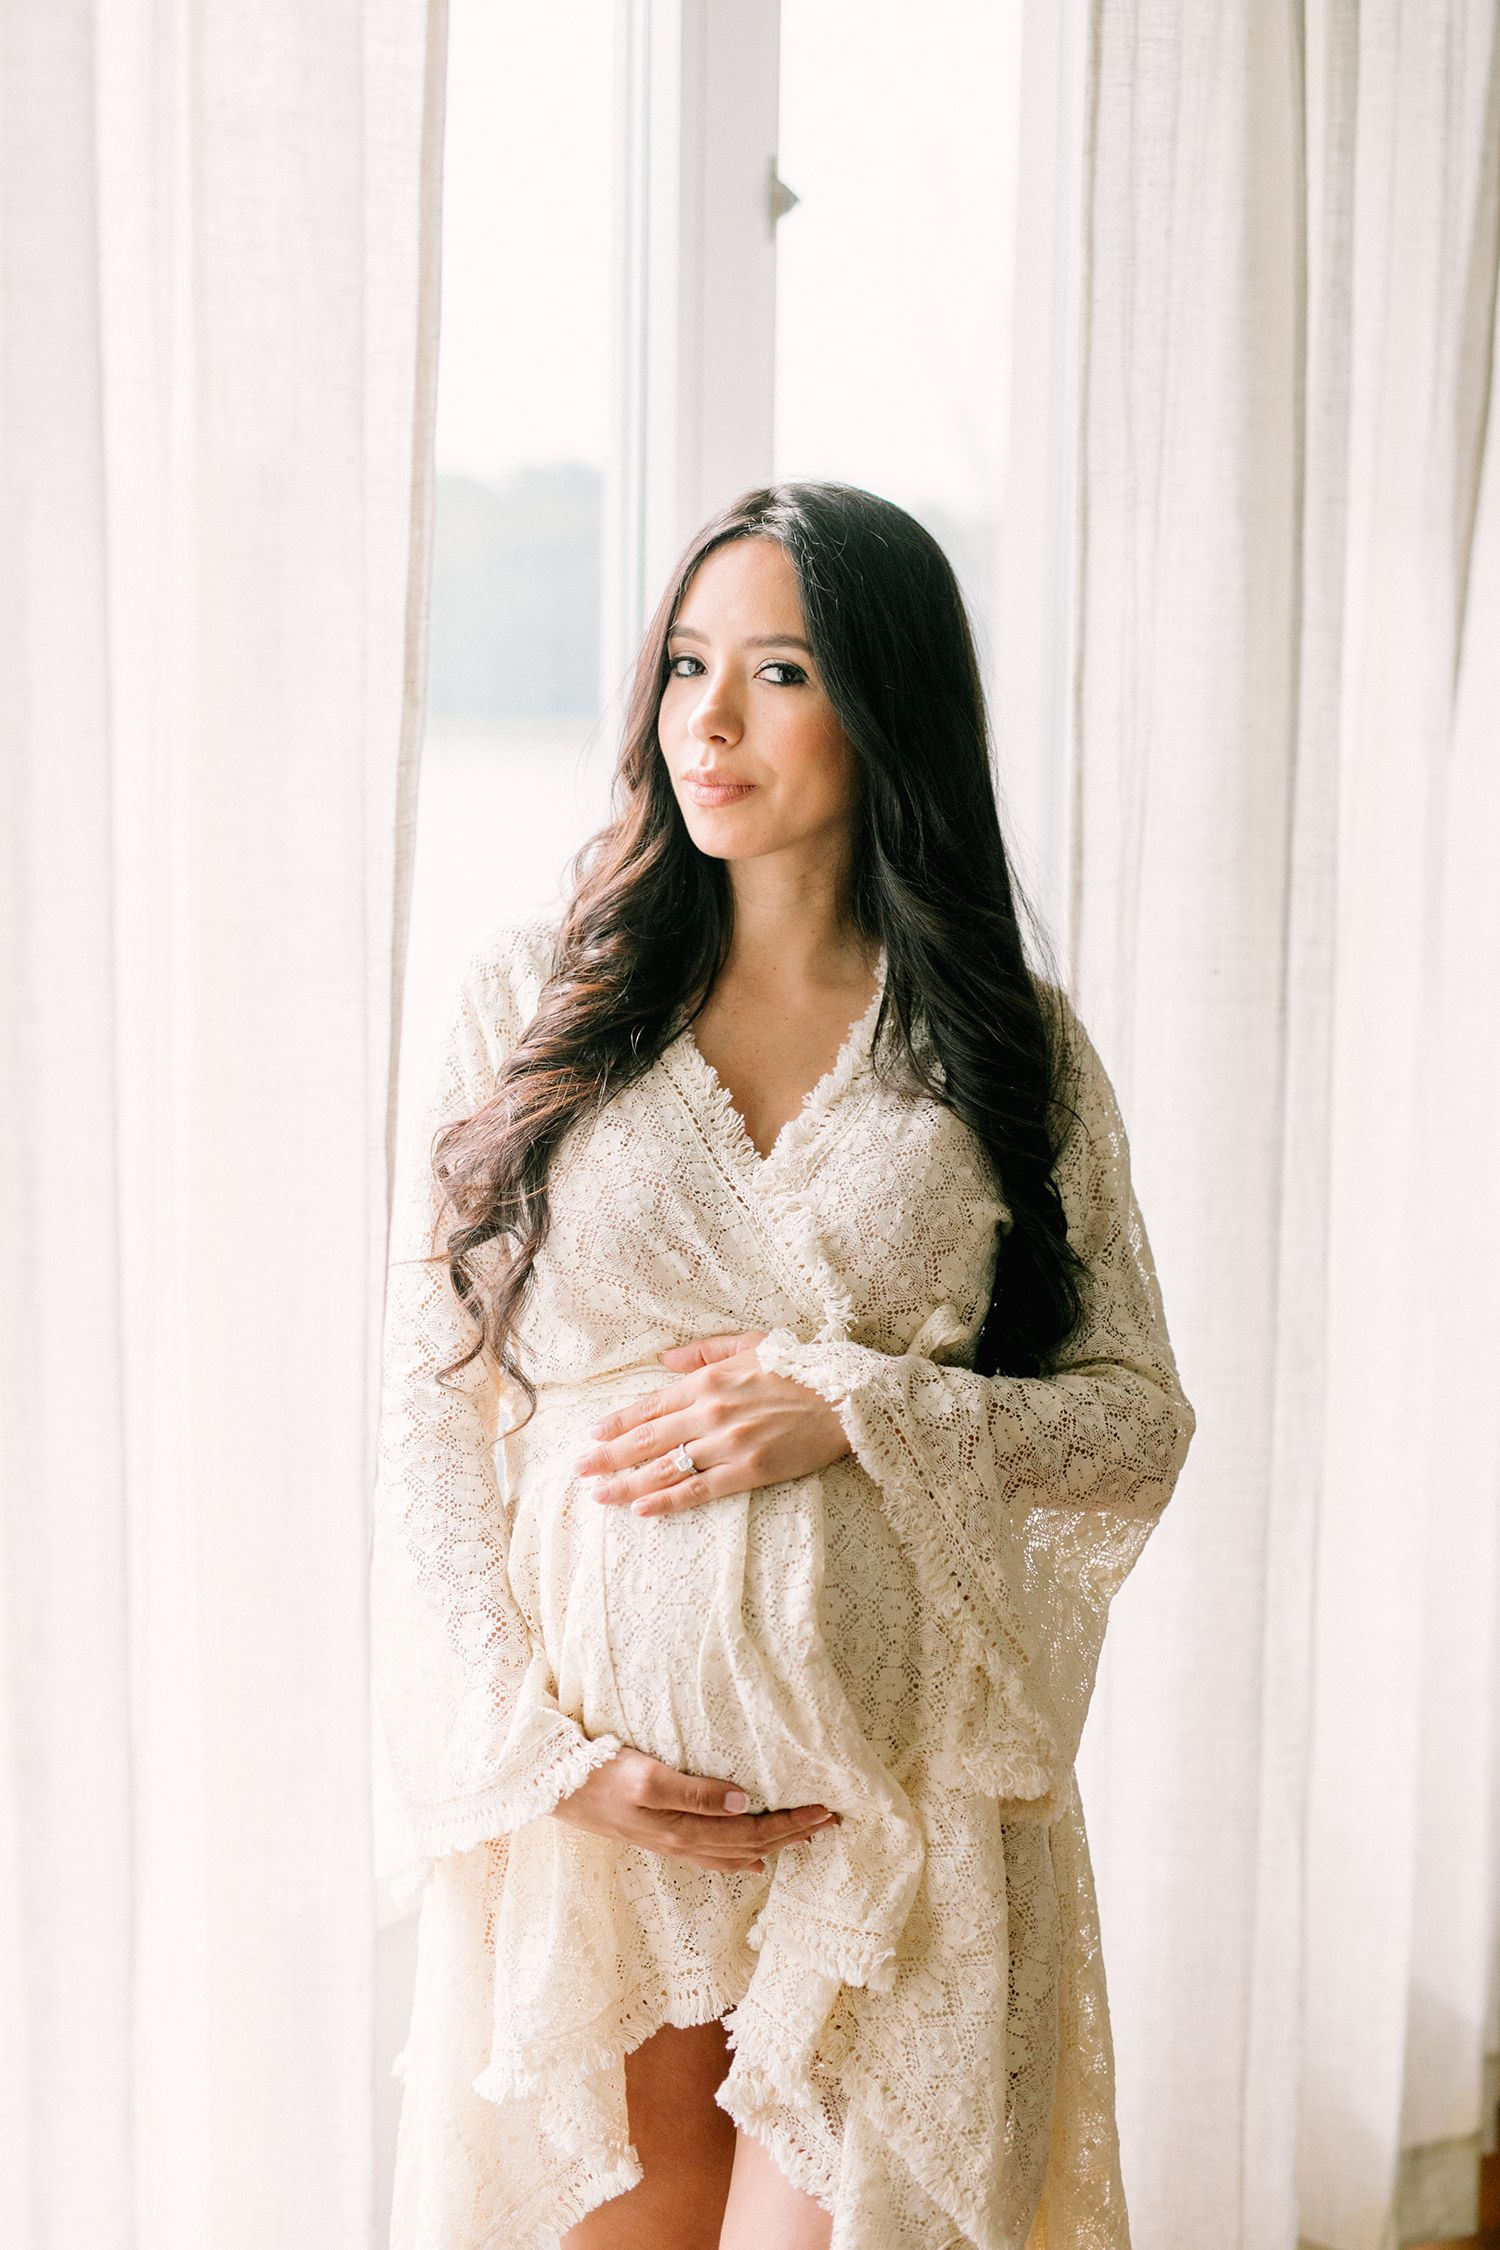 Mutterschaftssitzung zu Hause | Connecticut Fotografin – Stephanie Sunderland   – Maternity